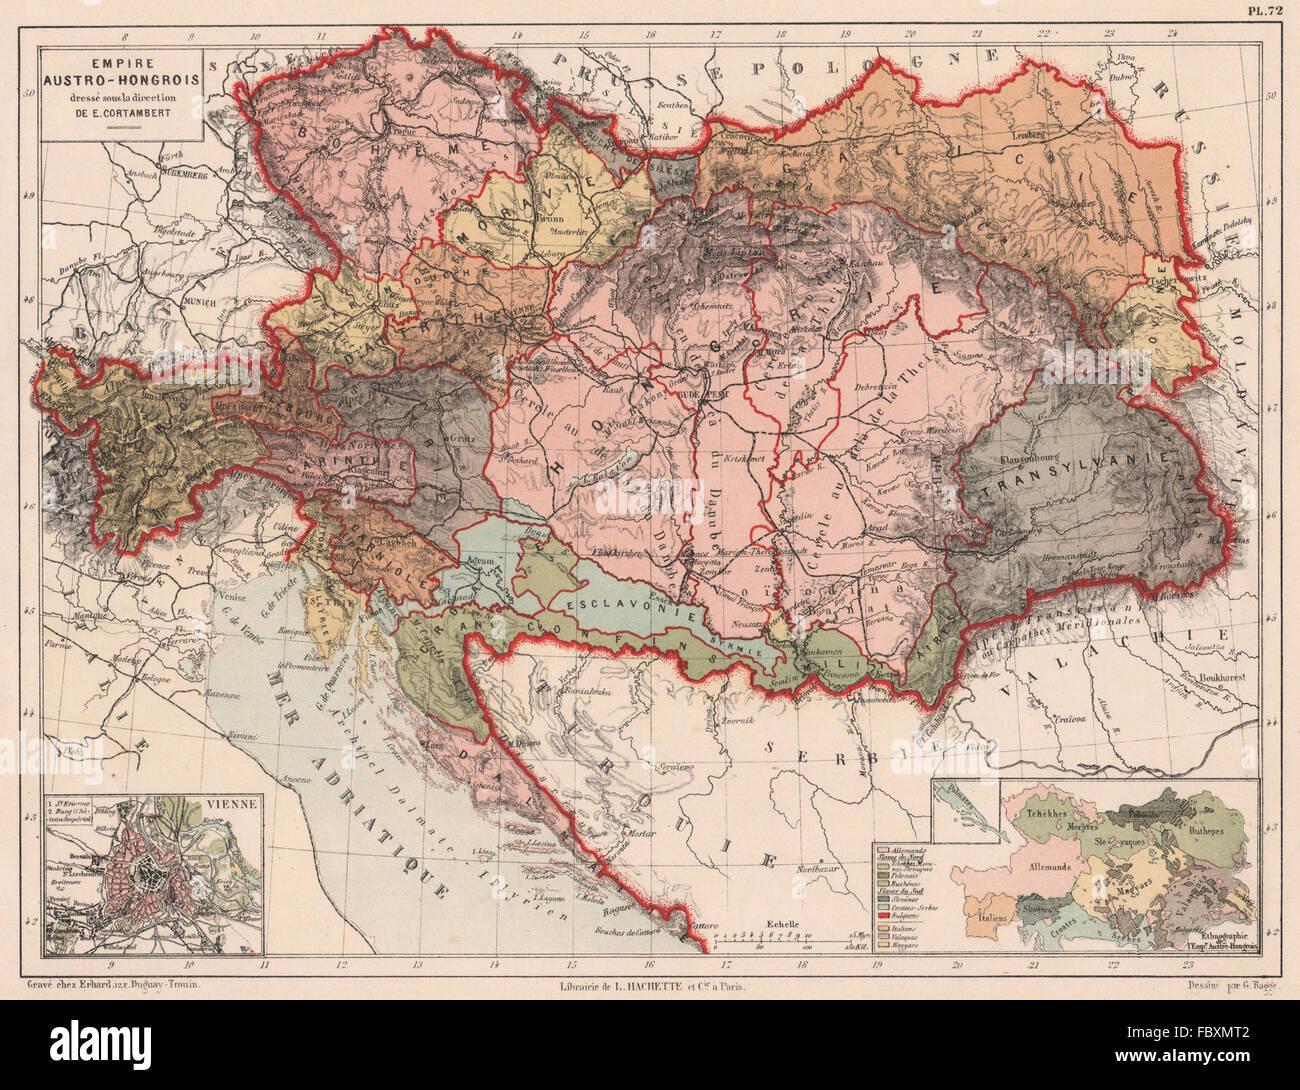 Austro-Hungarian Empire. Inset Vienna. Racial/Ethnographic map. Balkans 1880 - Stock Image